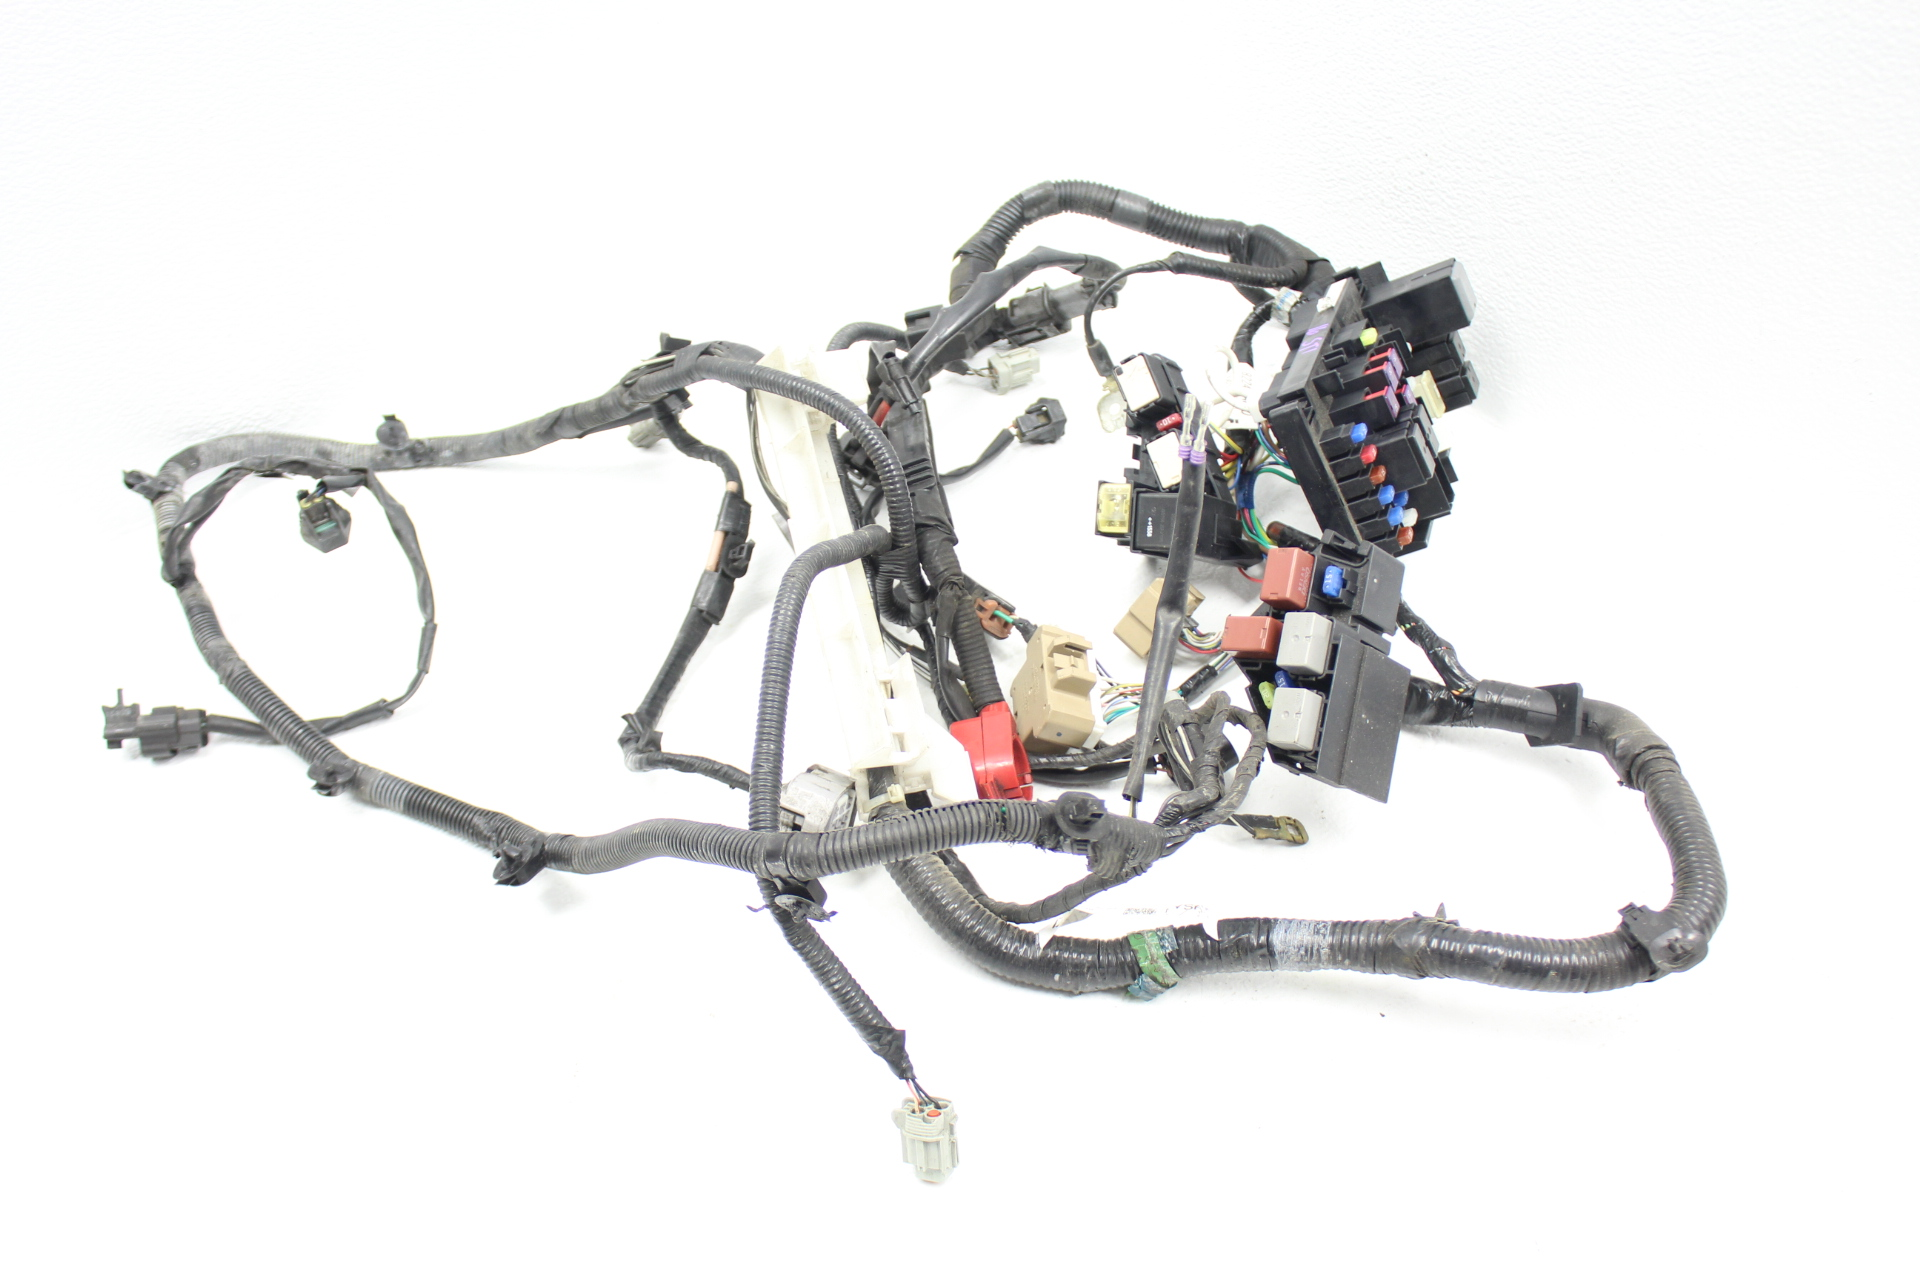 Subaru Wrx Sti Alternator Wiring Harness